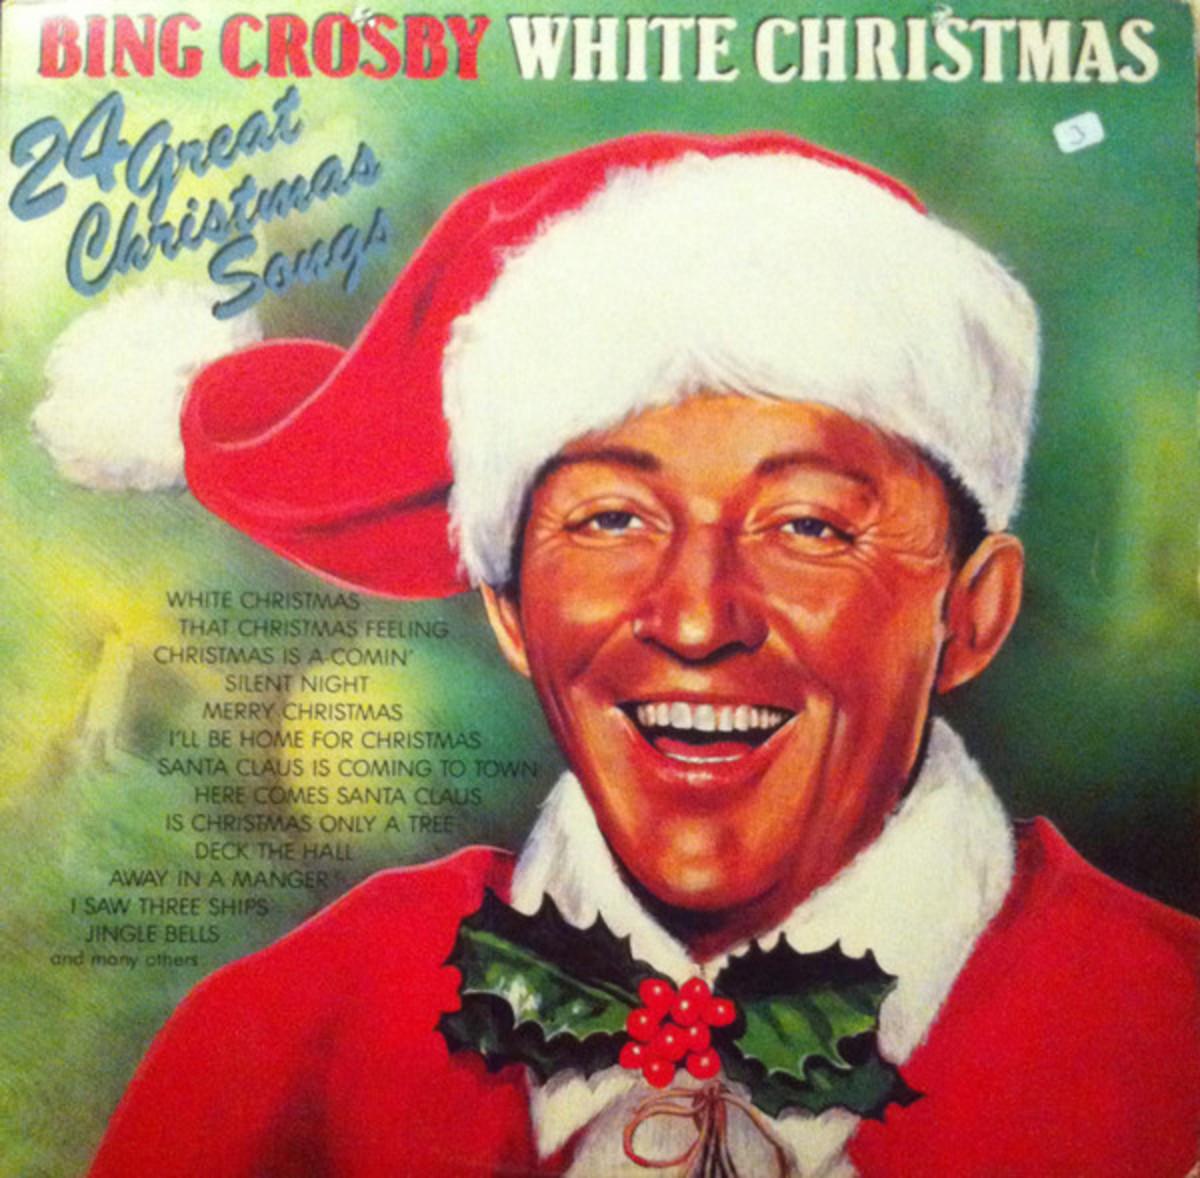 Bing Crosby—Merry Christmas